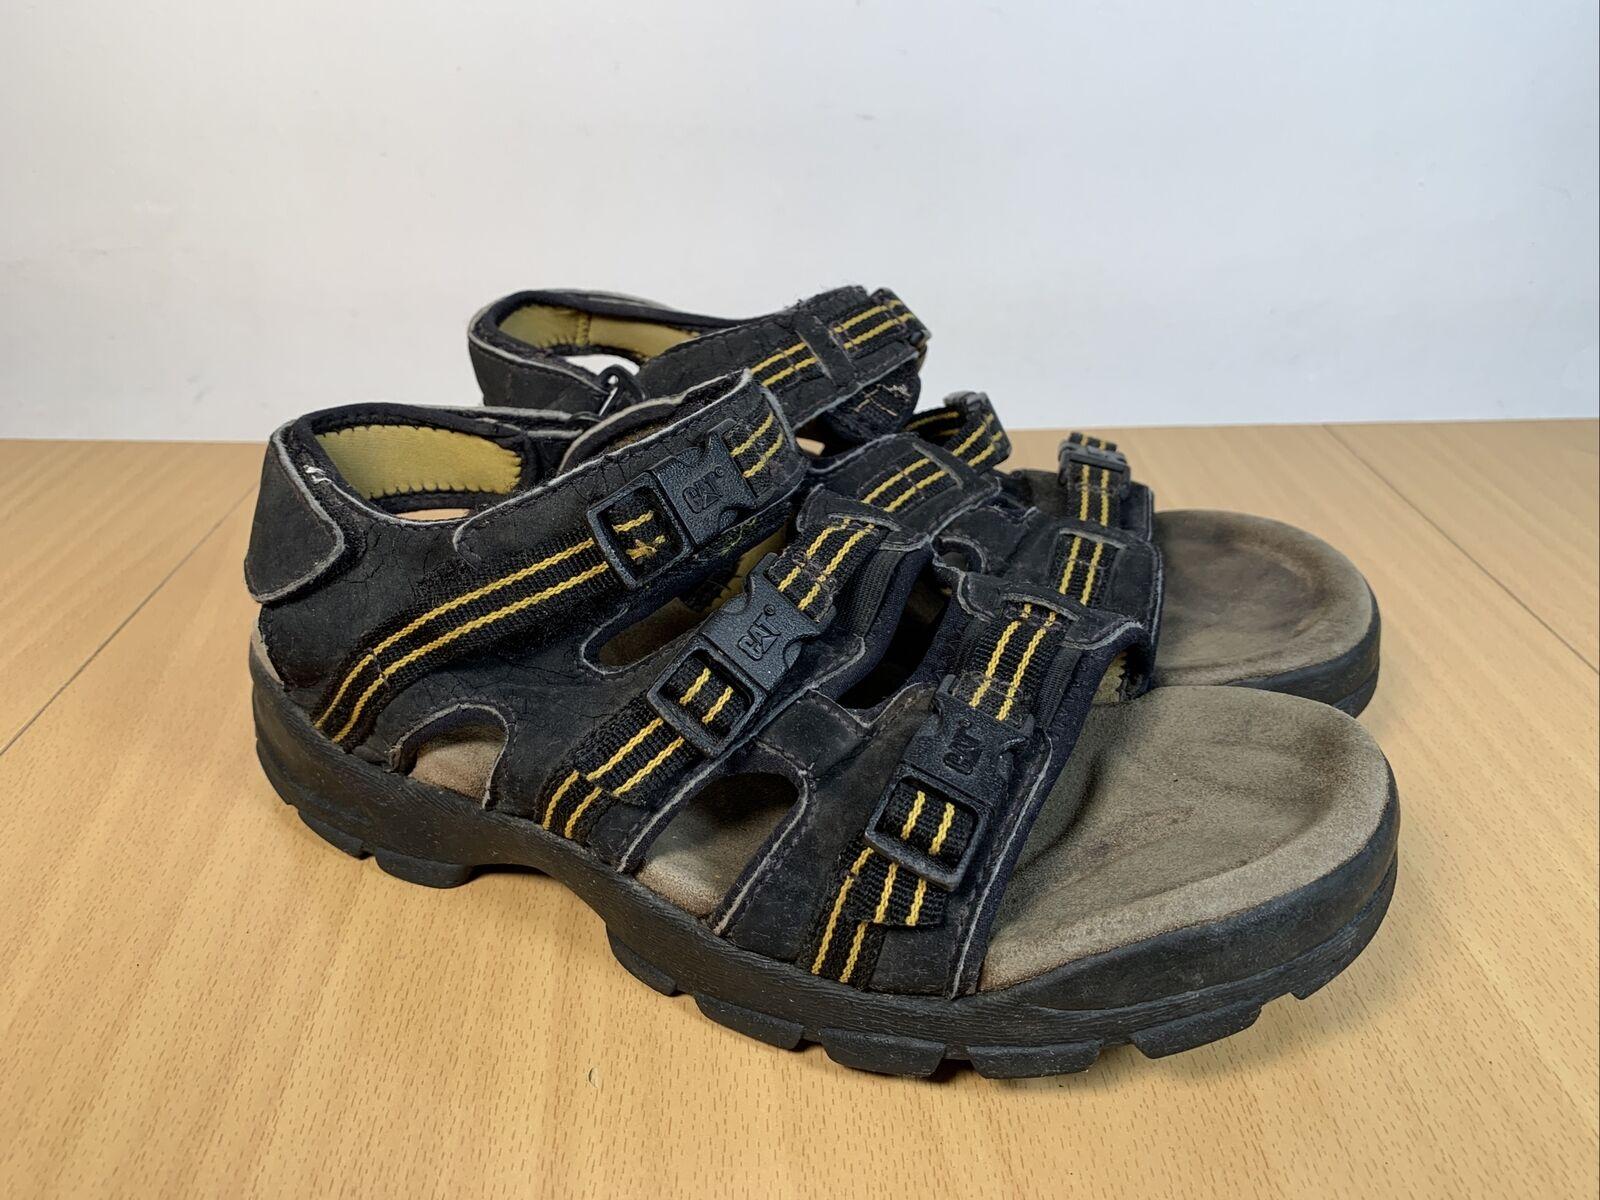 Caterpillar CAT Mens Wide Fit Adjustable Sports Walking Sandals Size UK 7 EUR 41